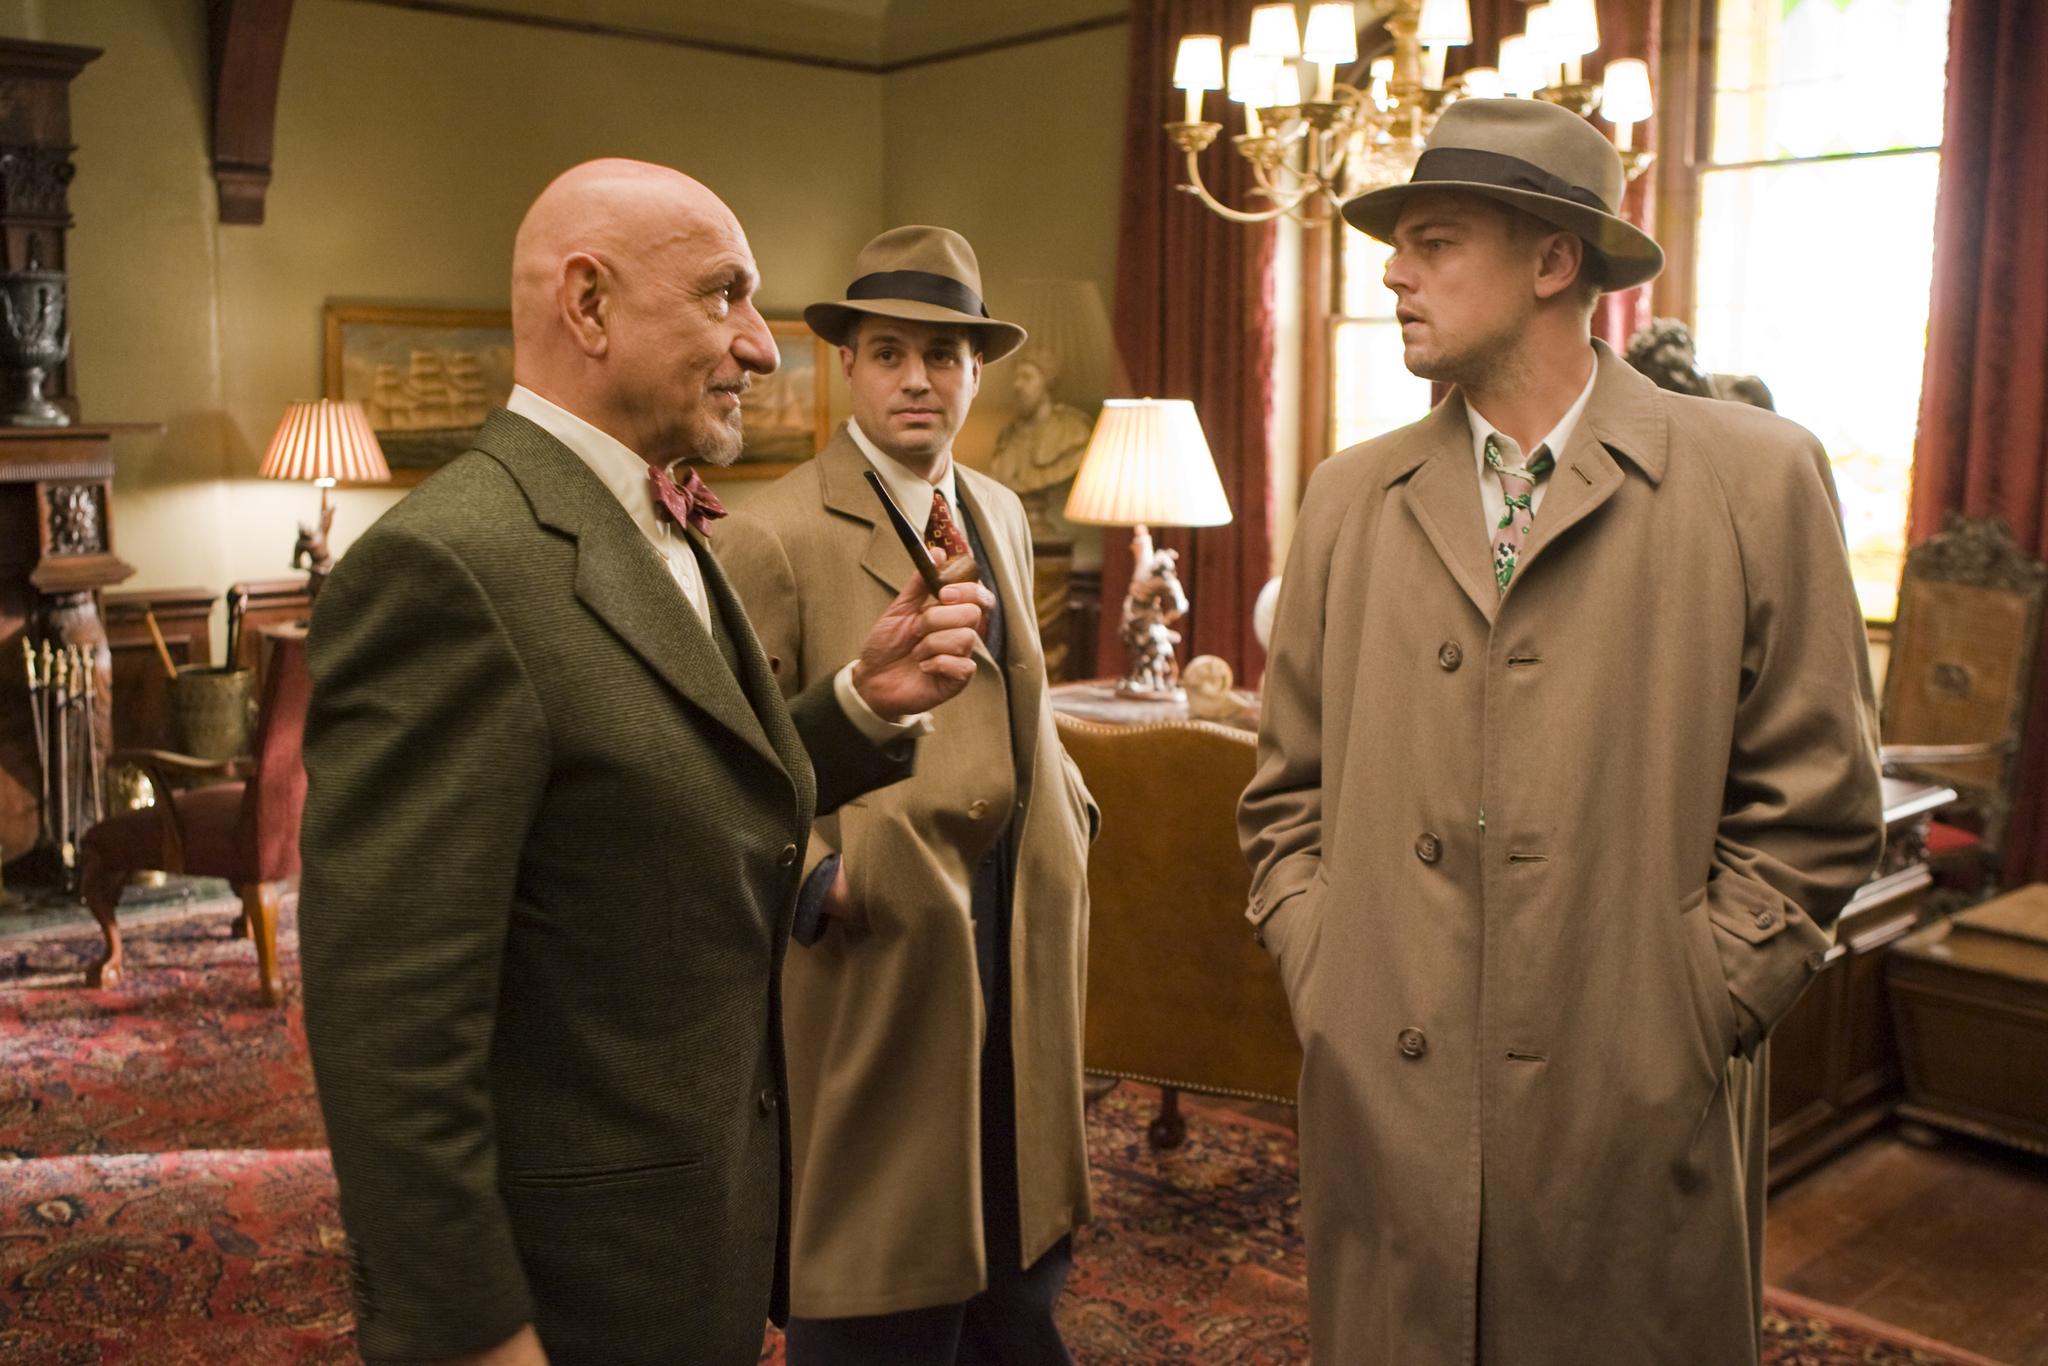 Leonardo DiCaprio, Ben Kingsley, and Mark Ruffalo in Shutter Island (2010)